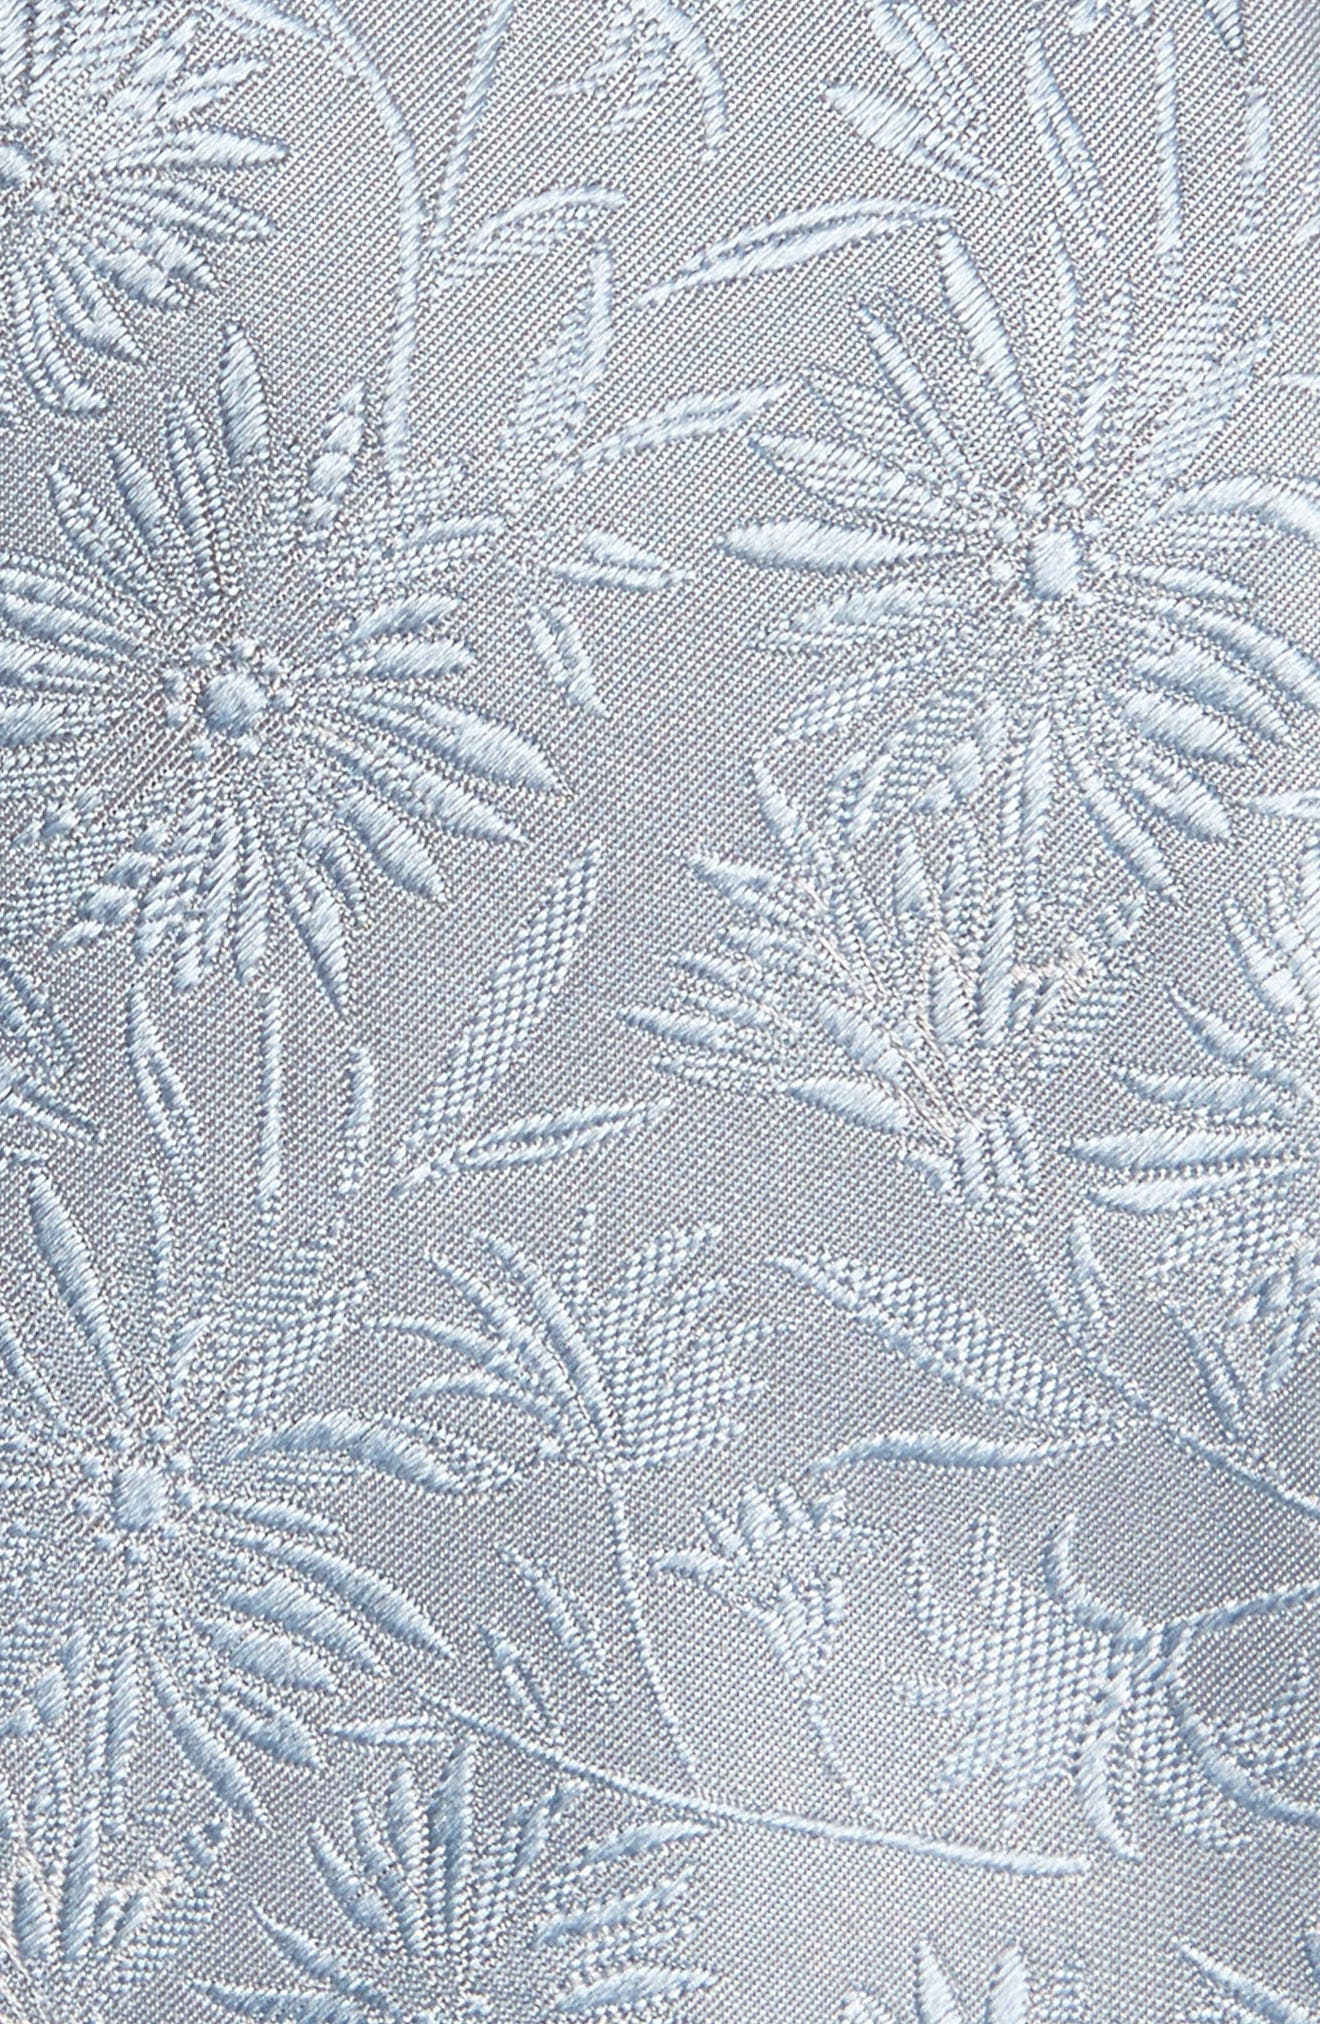 Tonal Floral Skinny Tie,                             Alternate thumbnail 2, color,                             Light Blue